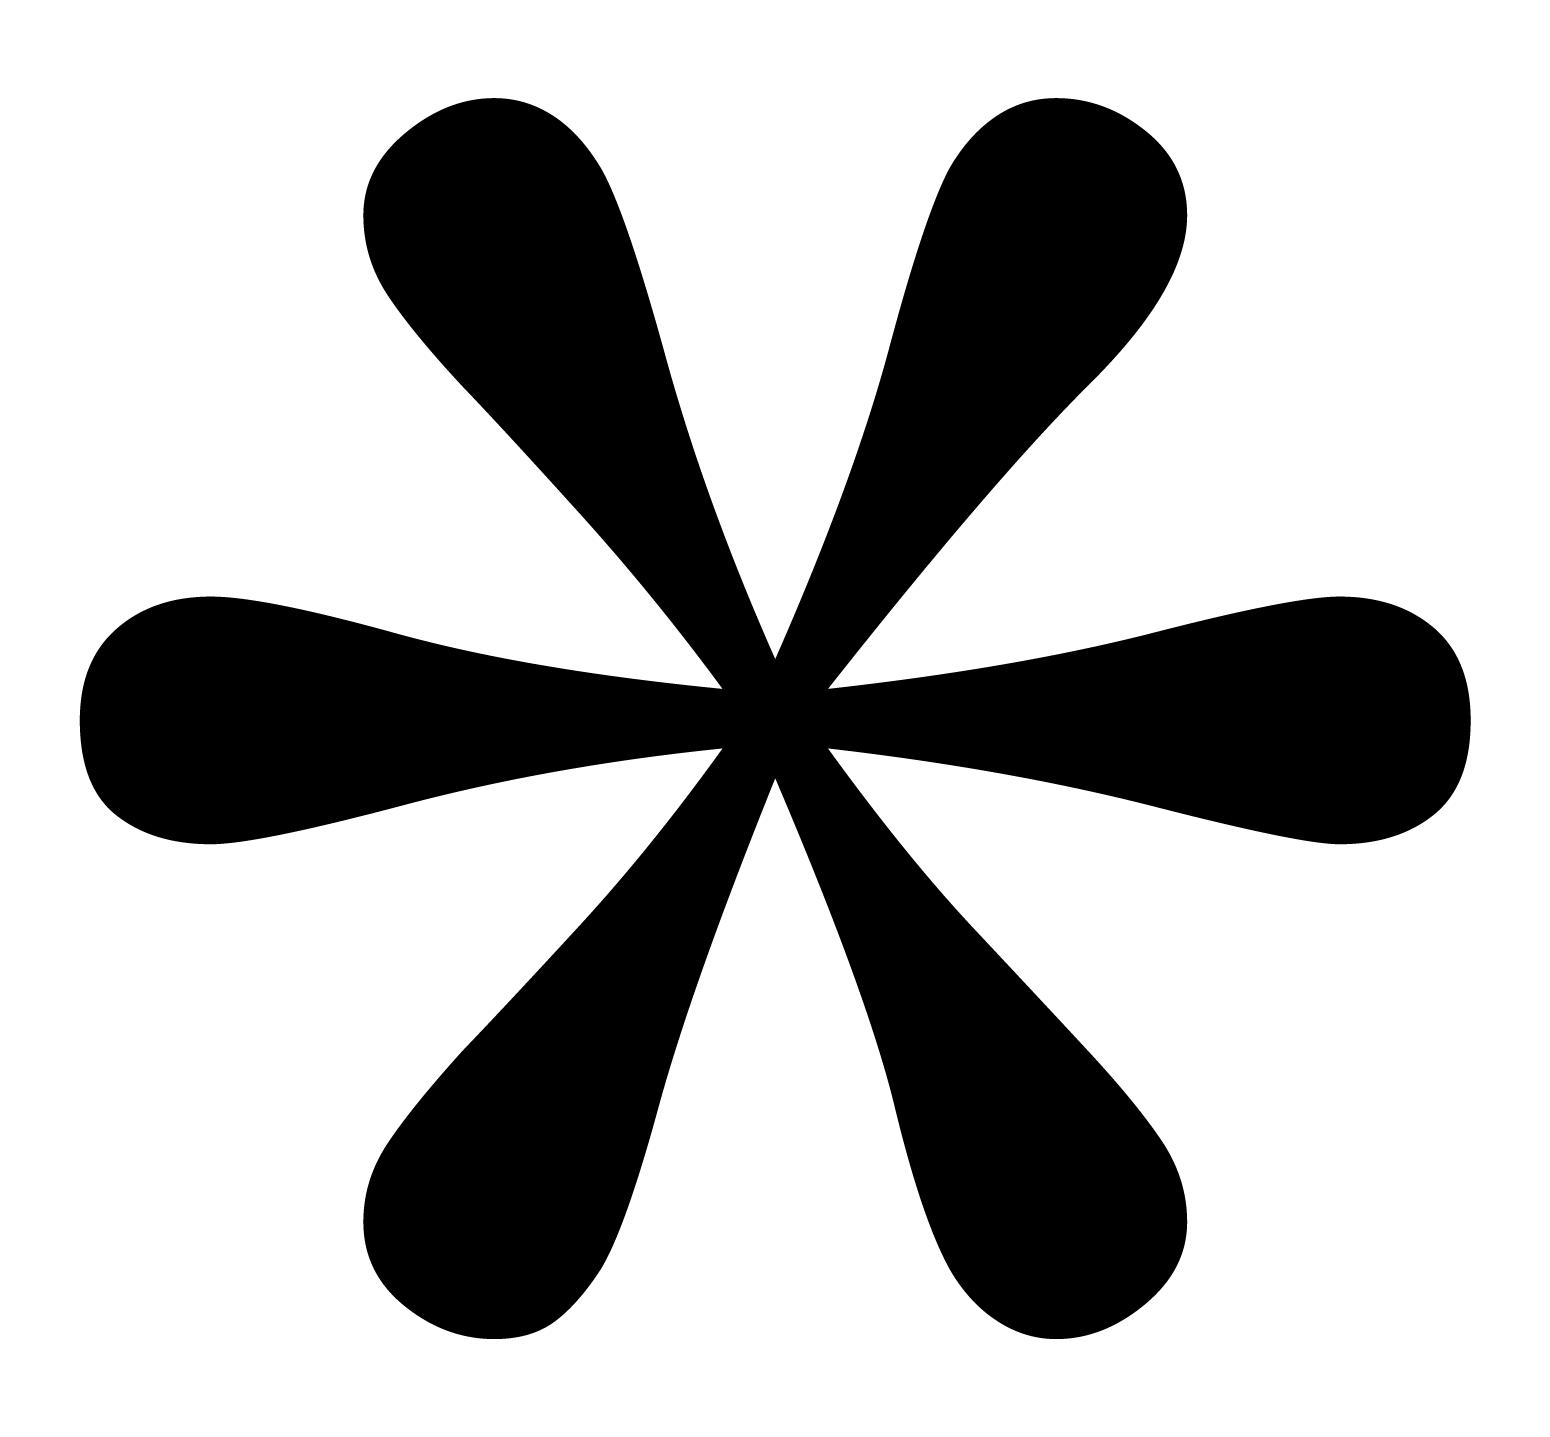 звездочка символ картинки